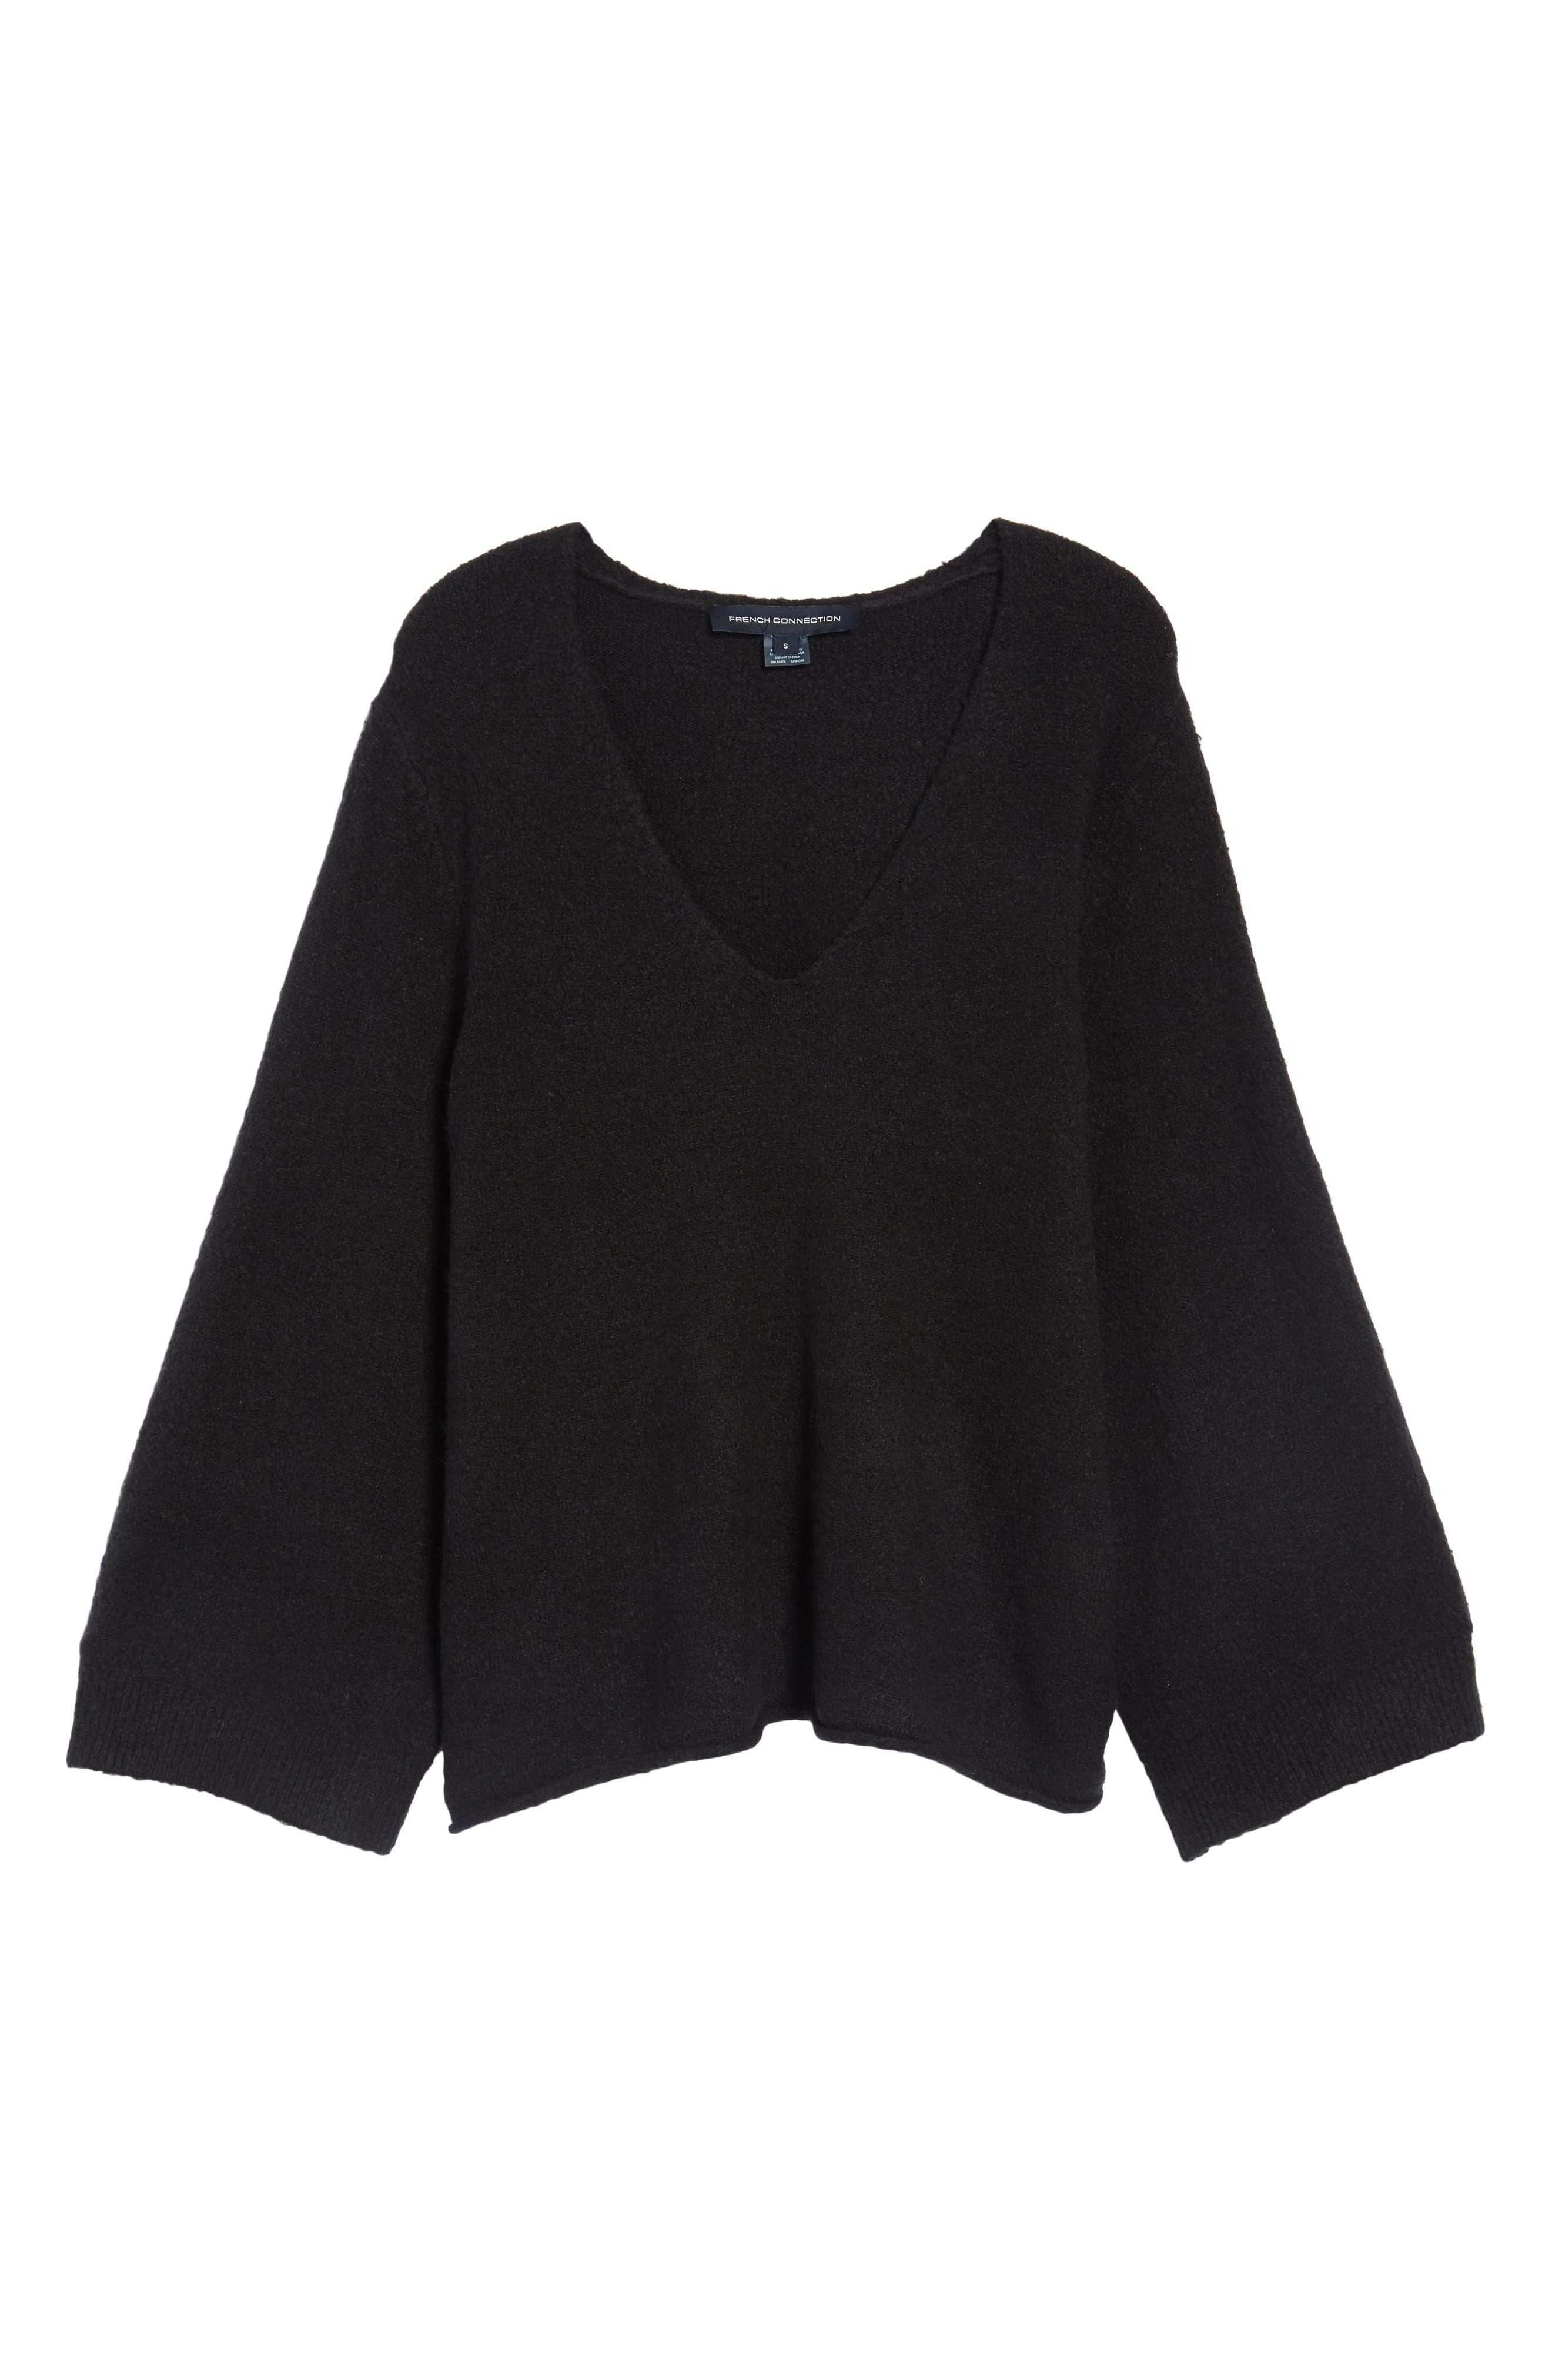 Urban Flossy Sweater,                             Alternate thumbnail 21, color,